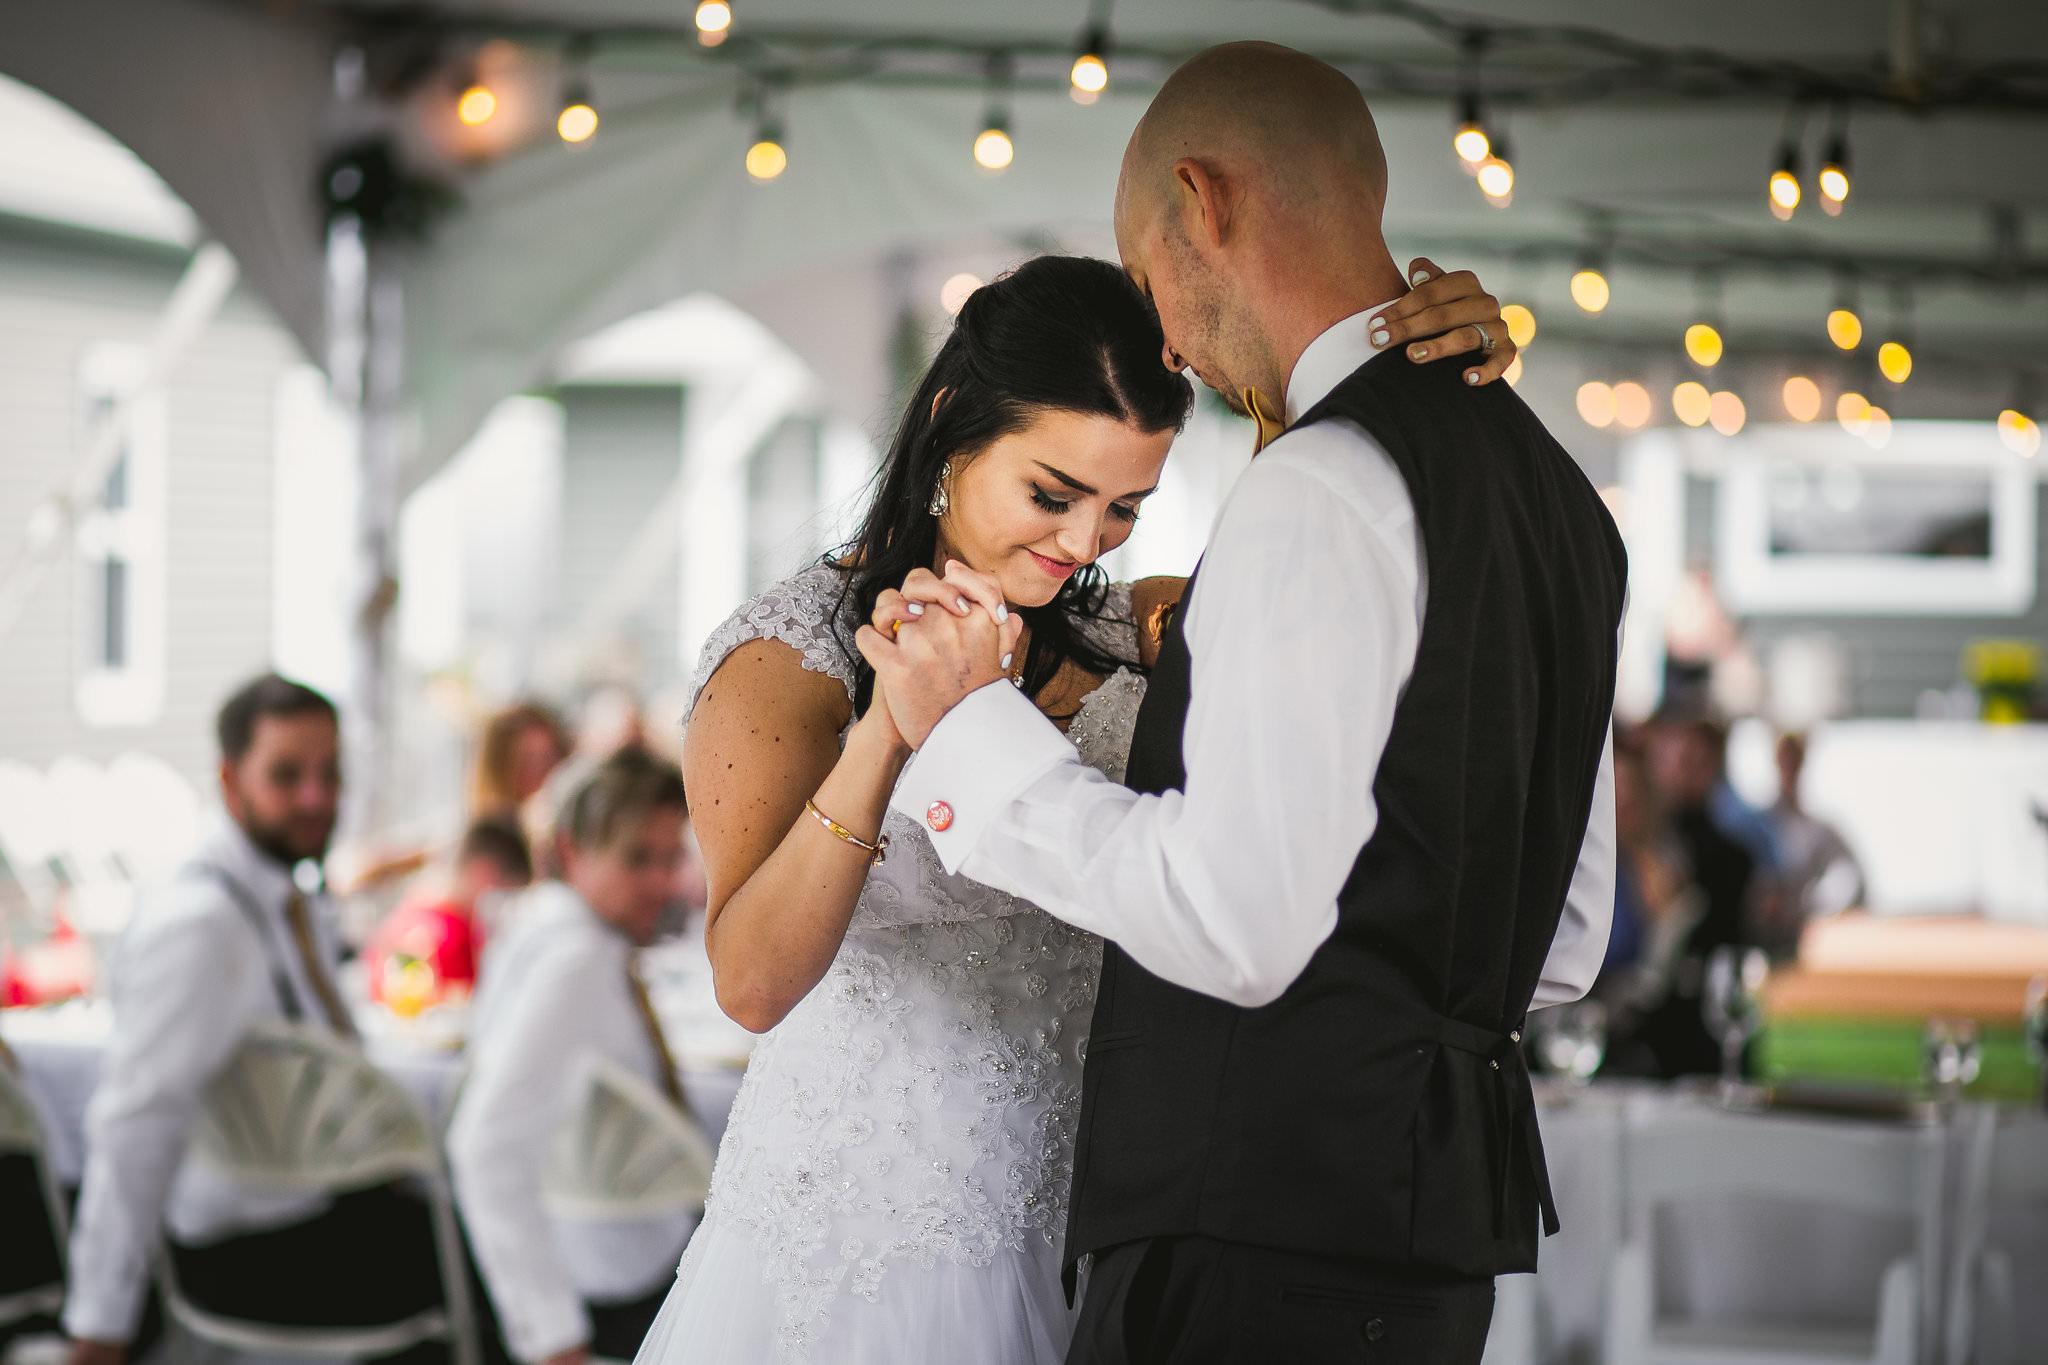 Kristen Adam Kindred Loft Whitby Wedding Photos 379 - Durham Wedding Photographer: Kindred Loft Wedding Photos